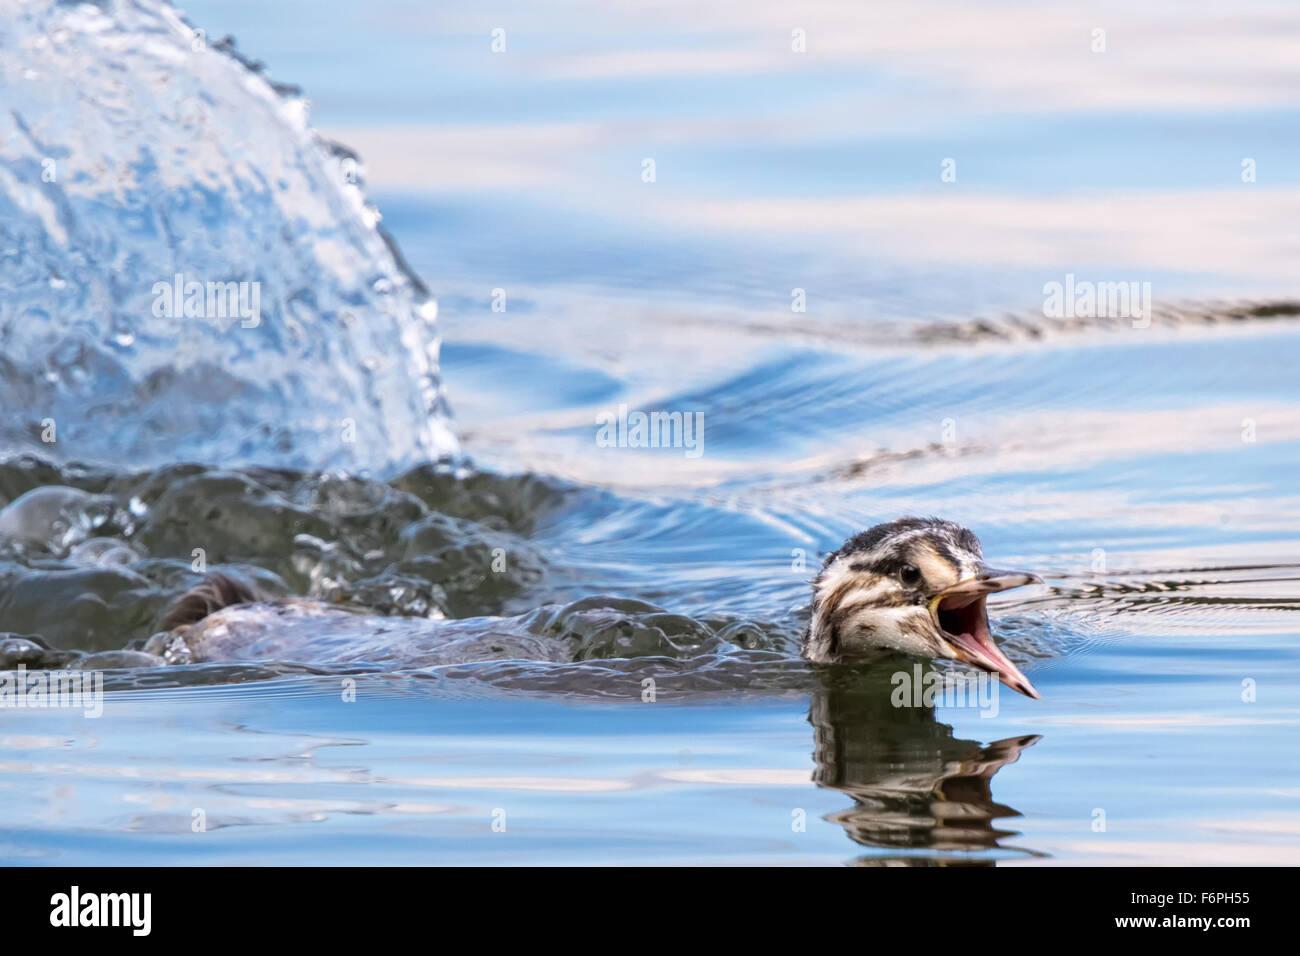 Juvenile grebe swimming - Stock Image